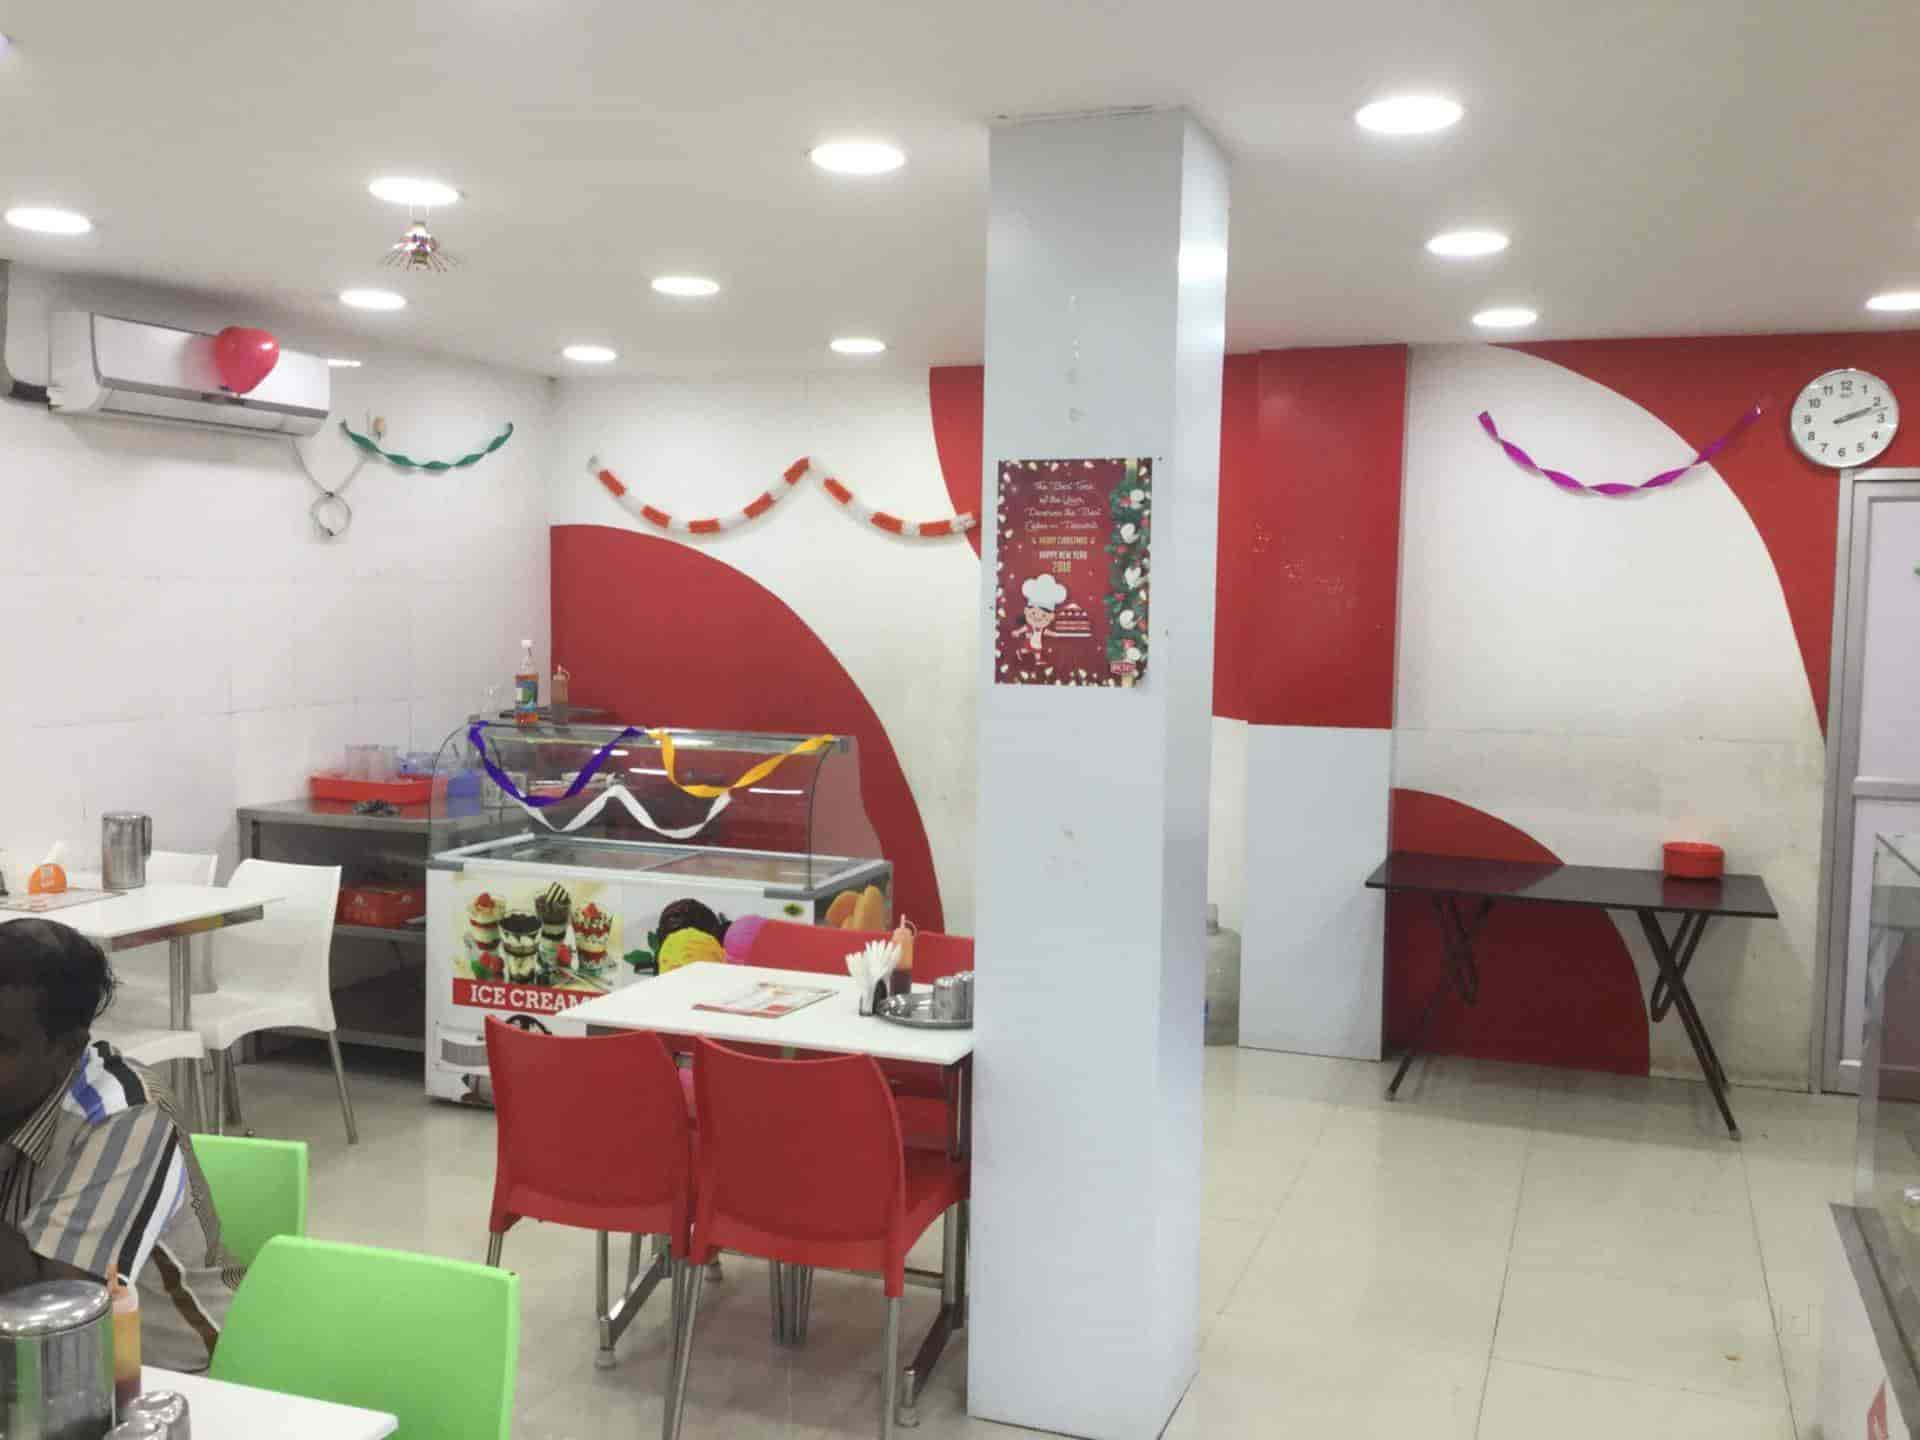 FB Cake House & Sweets, Keelakattalai, Chennai - Bakeries